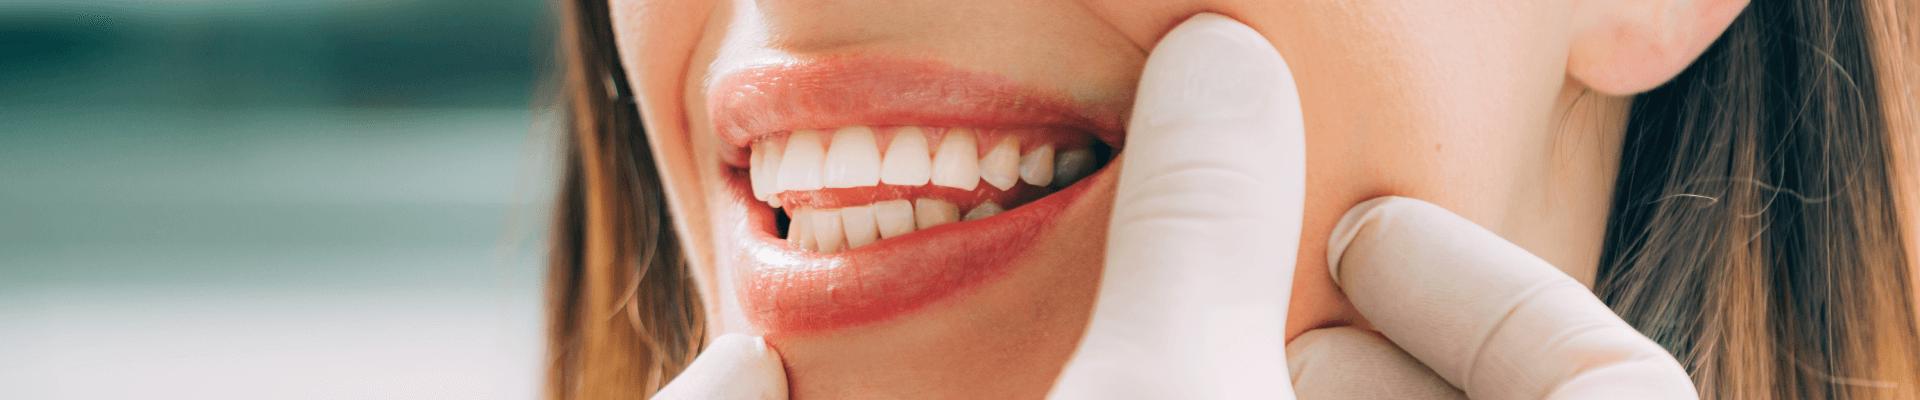 Odontoiatria ed Estetica del sorriso